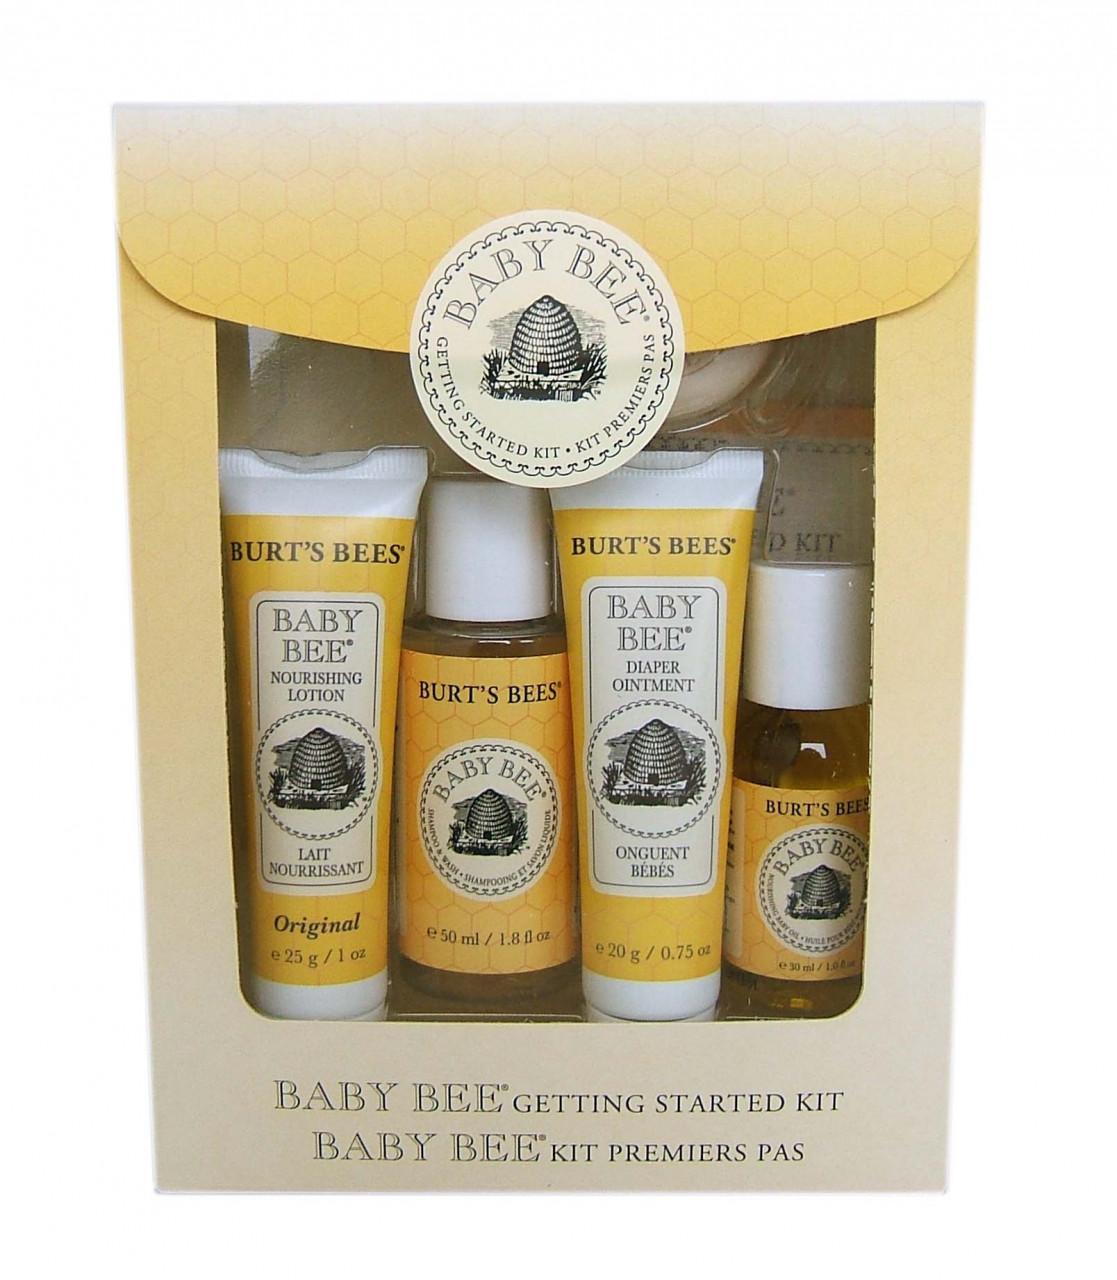 burt-bees-baby-bee-starter-kit